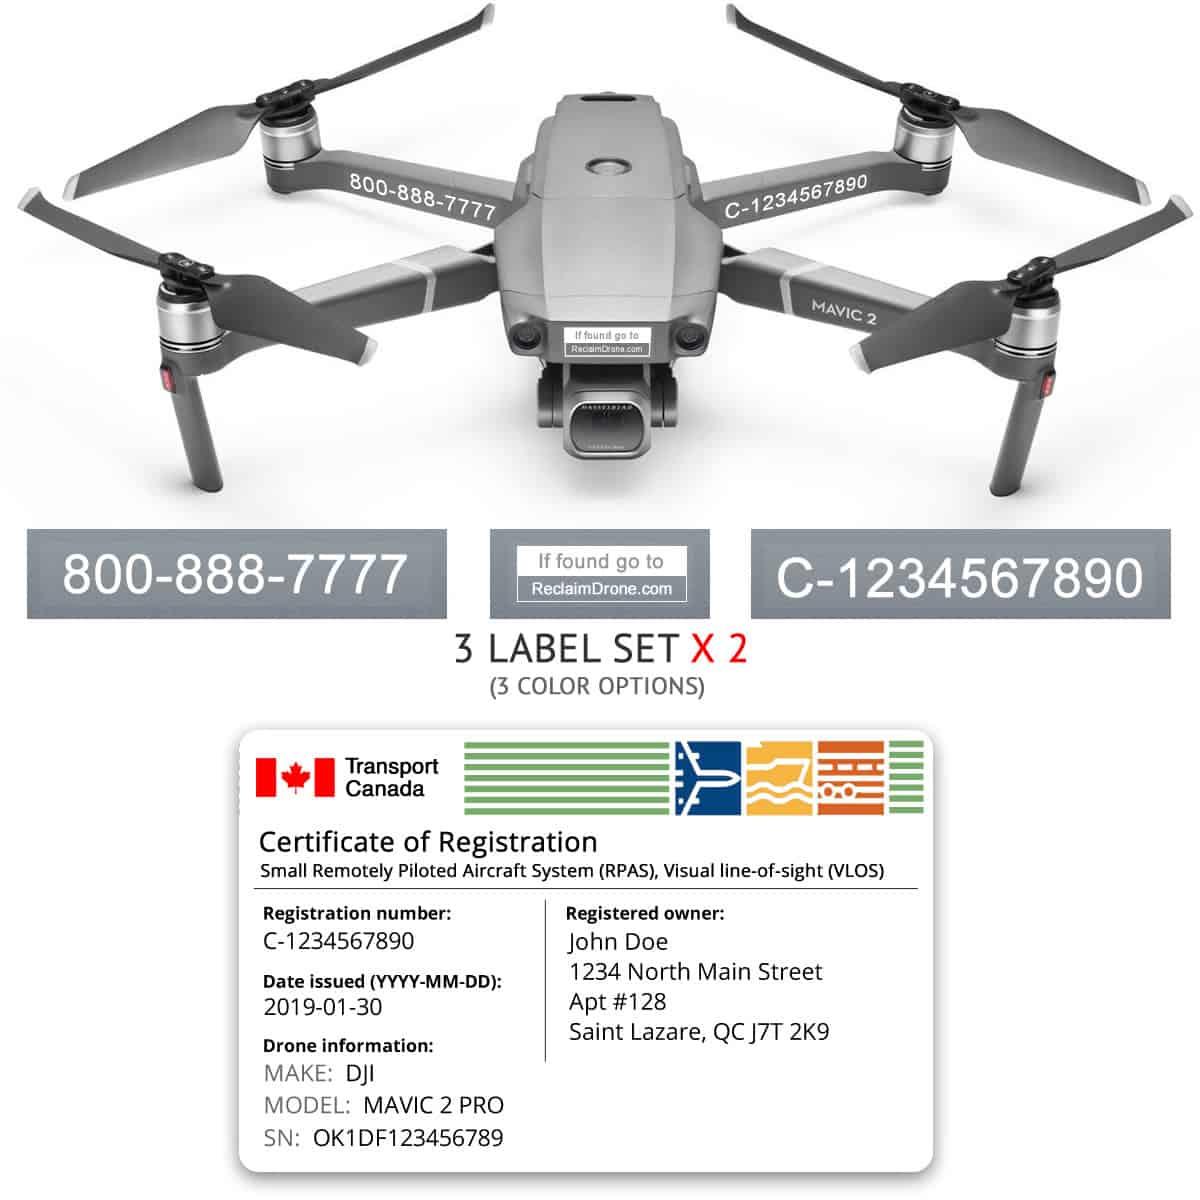 Mavic 2 Pro   Zoom drone registration bundle for Canada